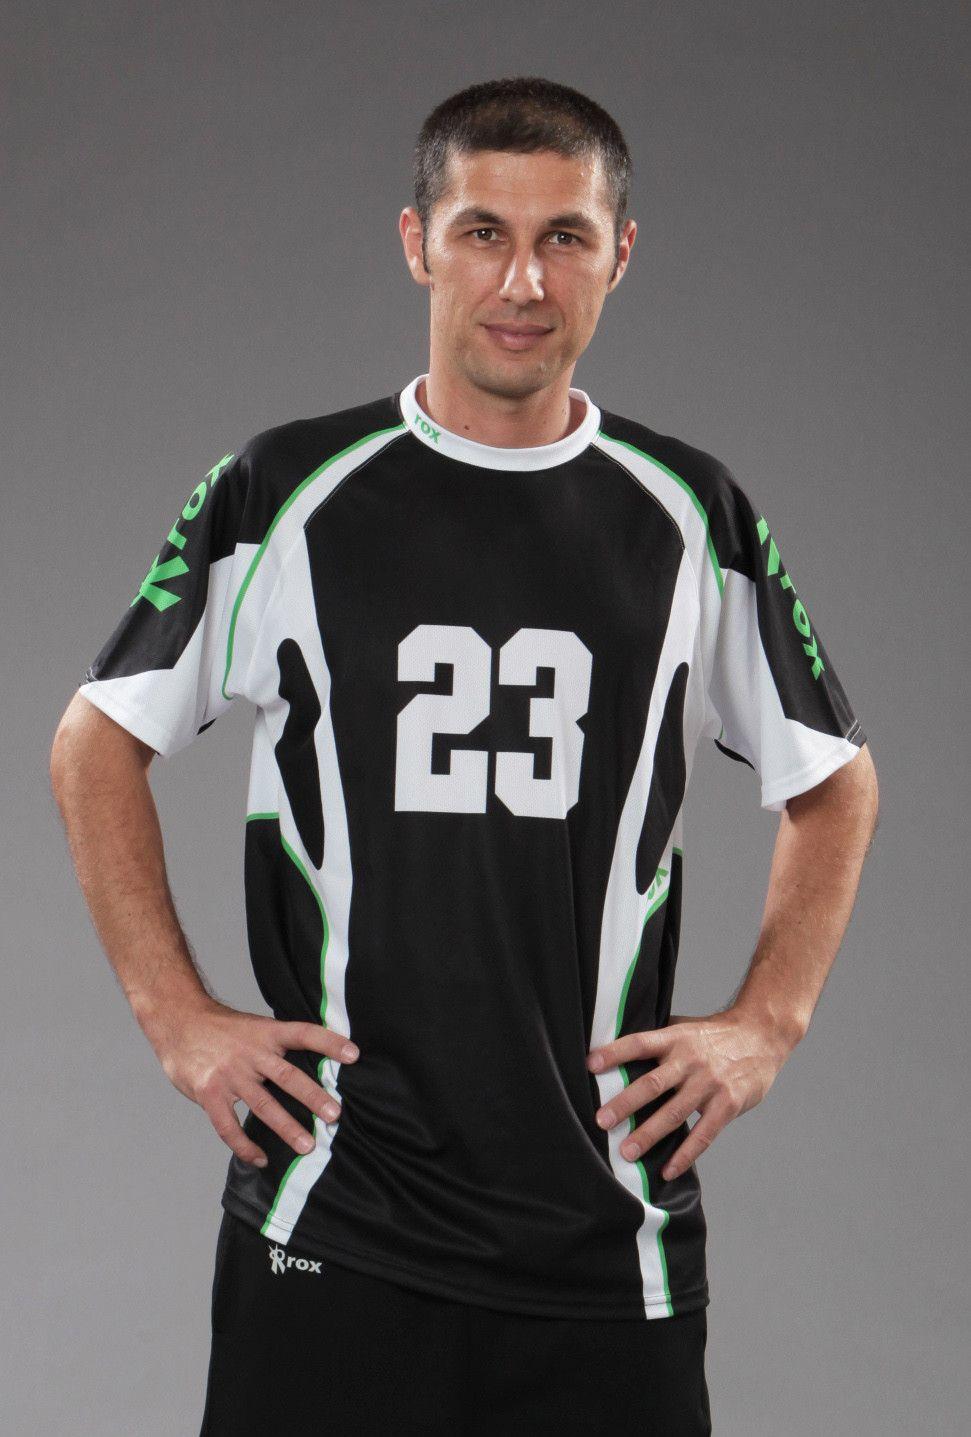 Phantom Men's Sublimated Jersey Fantasy football shirt